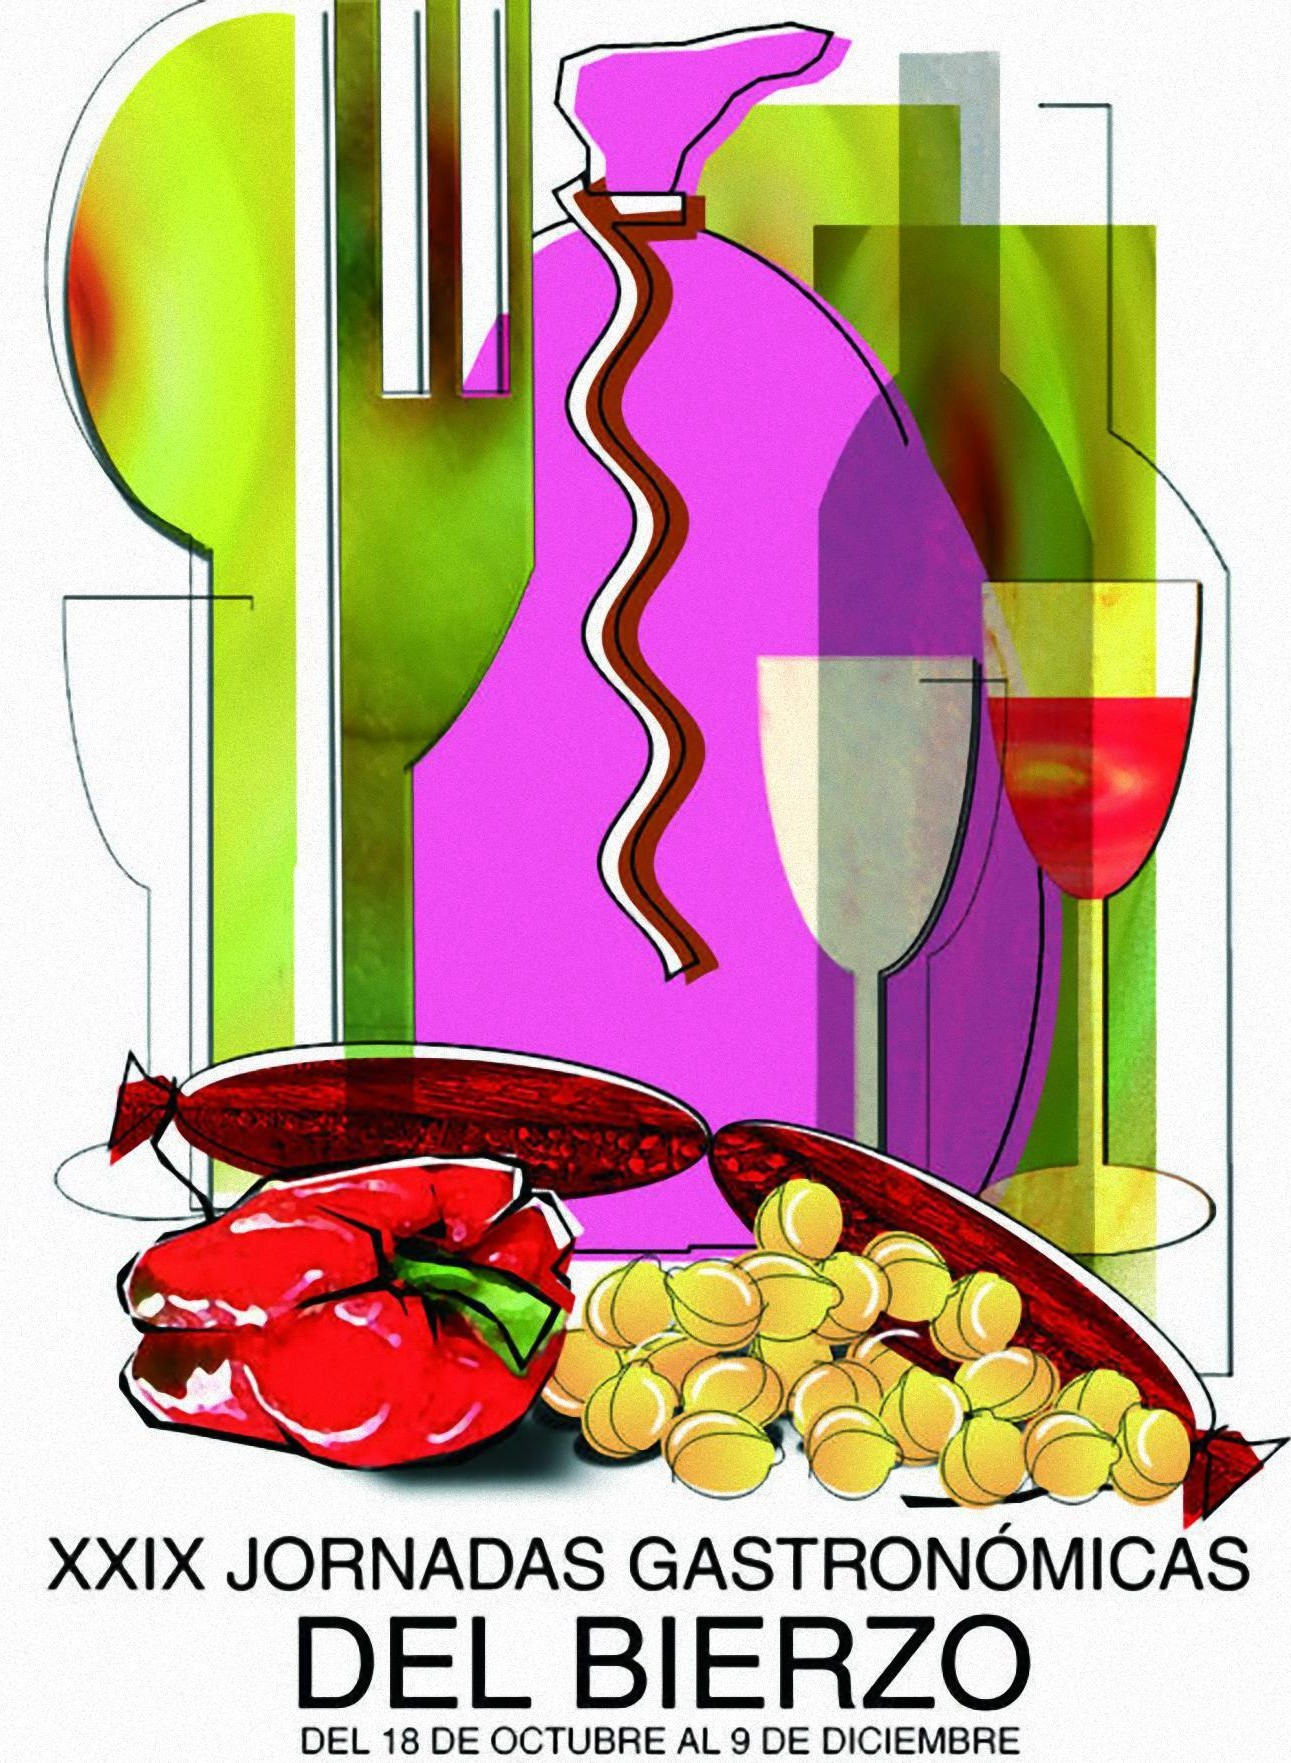 Jornadas gastronomicas del bierzo 2013_e